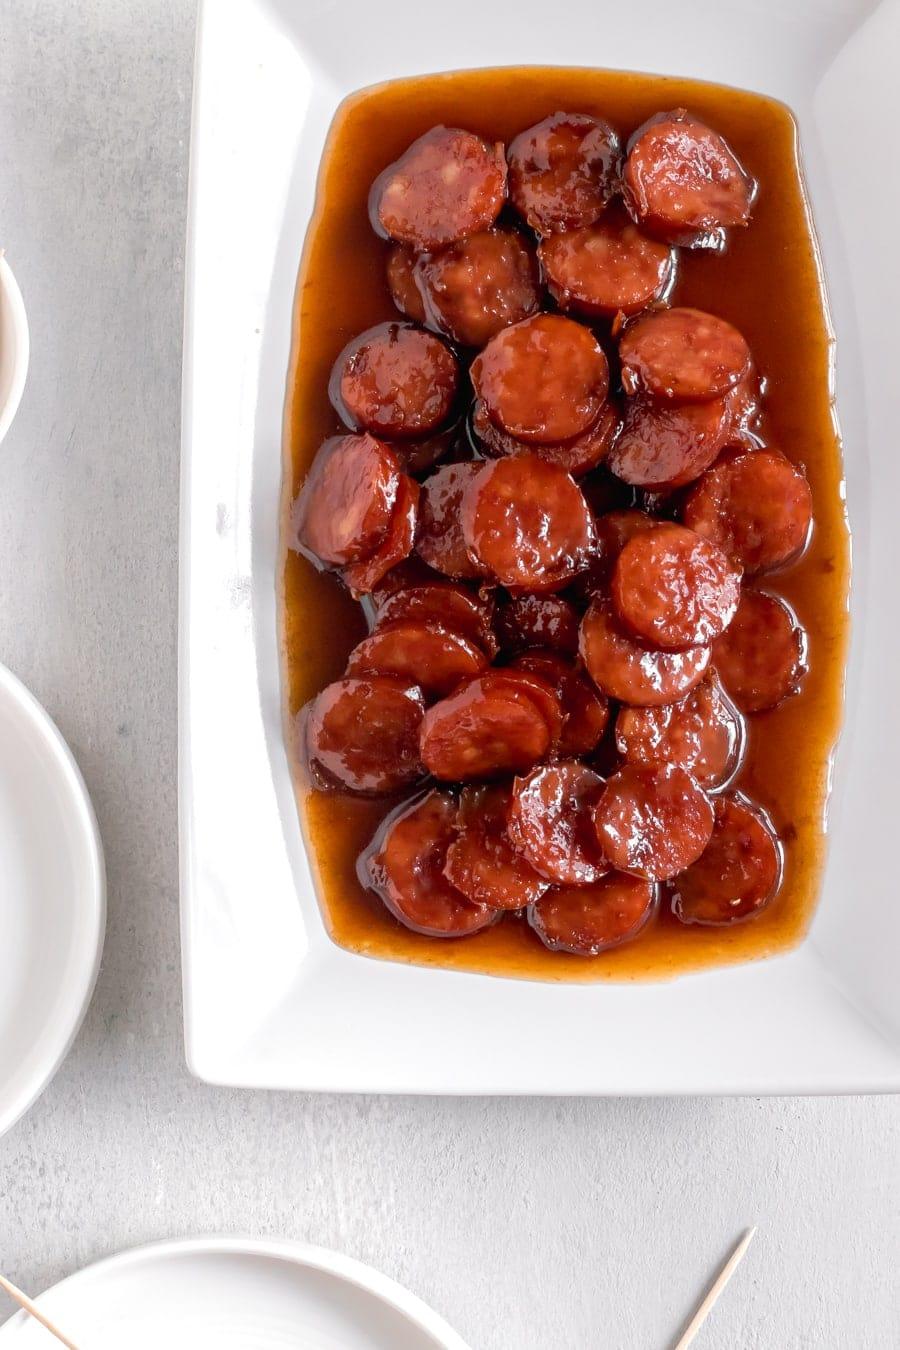 Brown Sugar Glazed Kielbasa Bites in serving dish